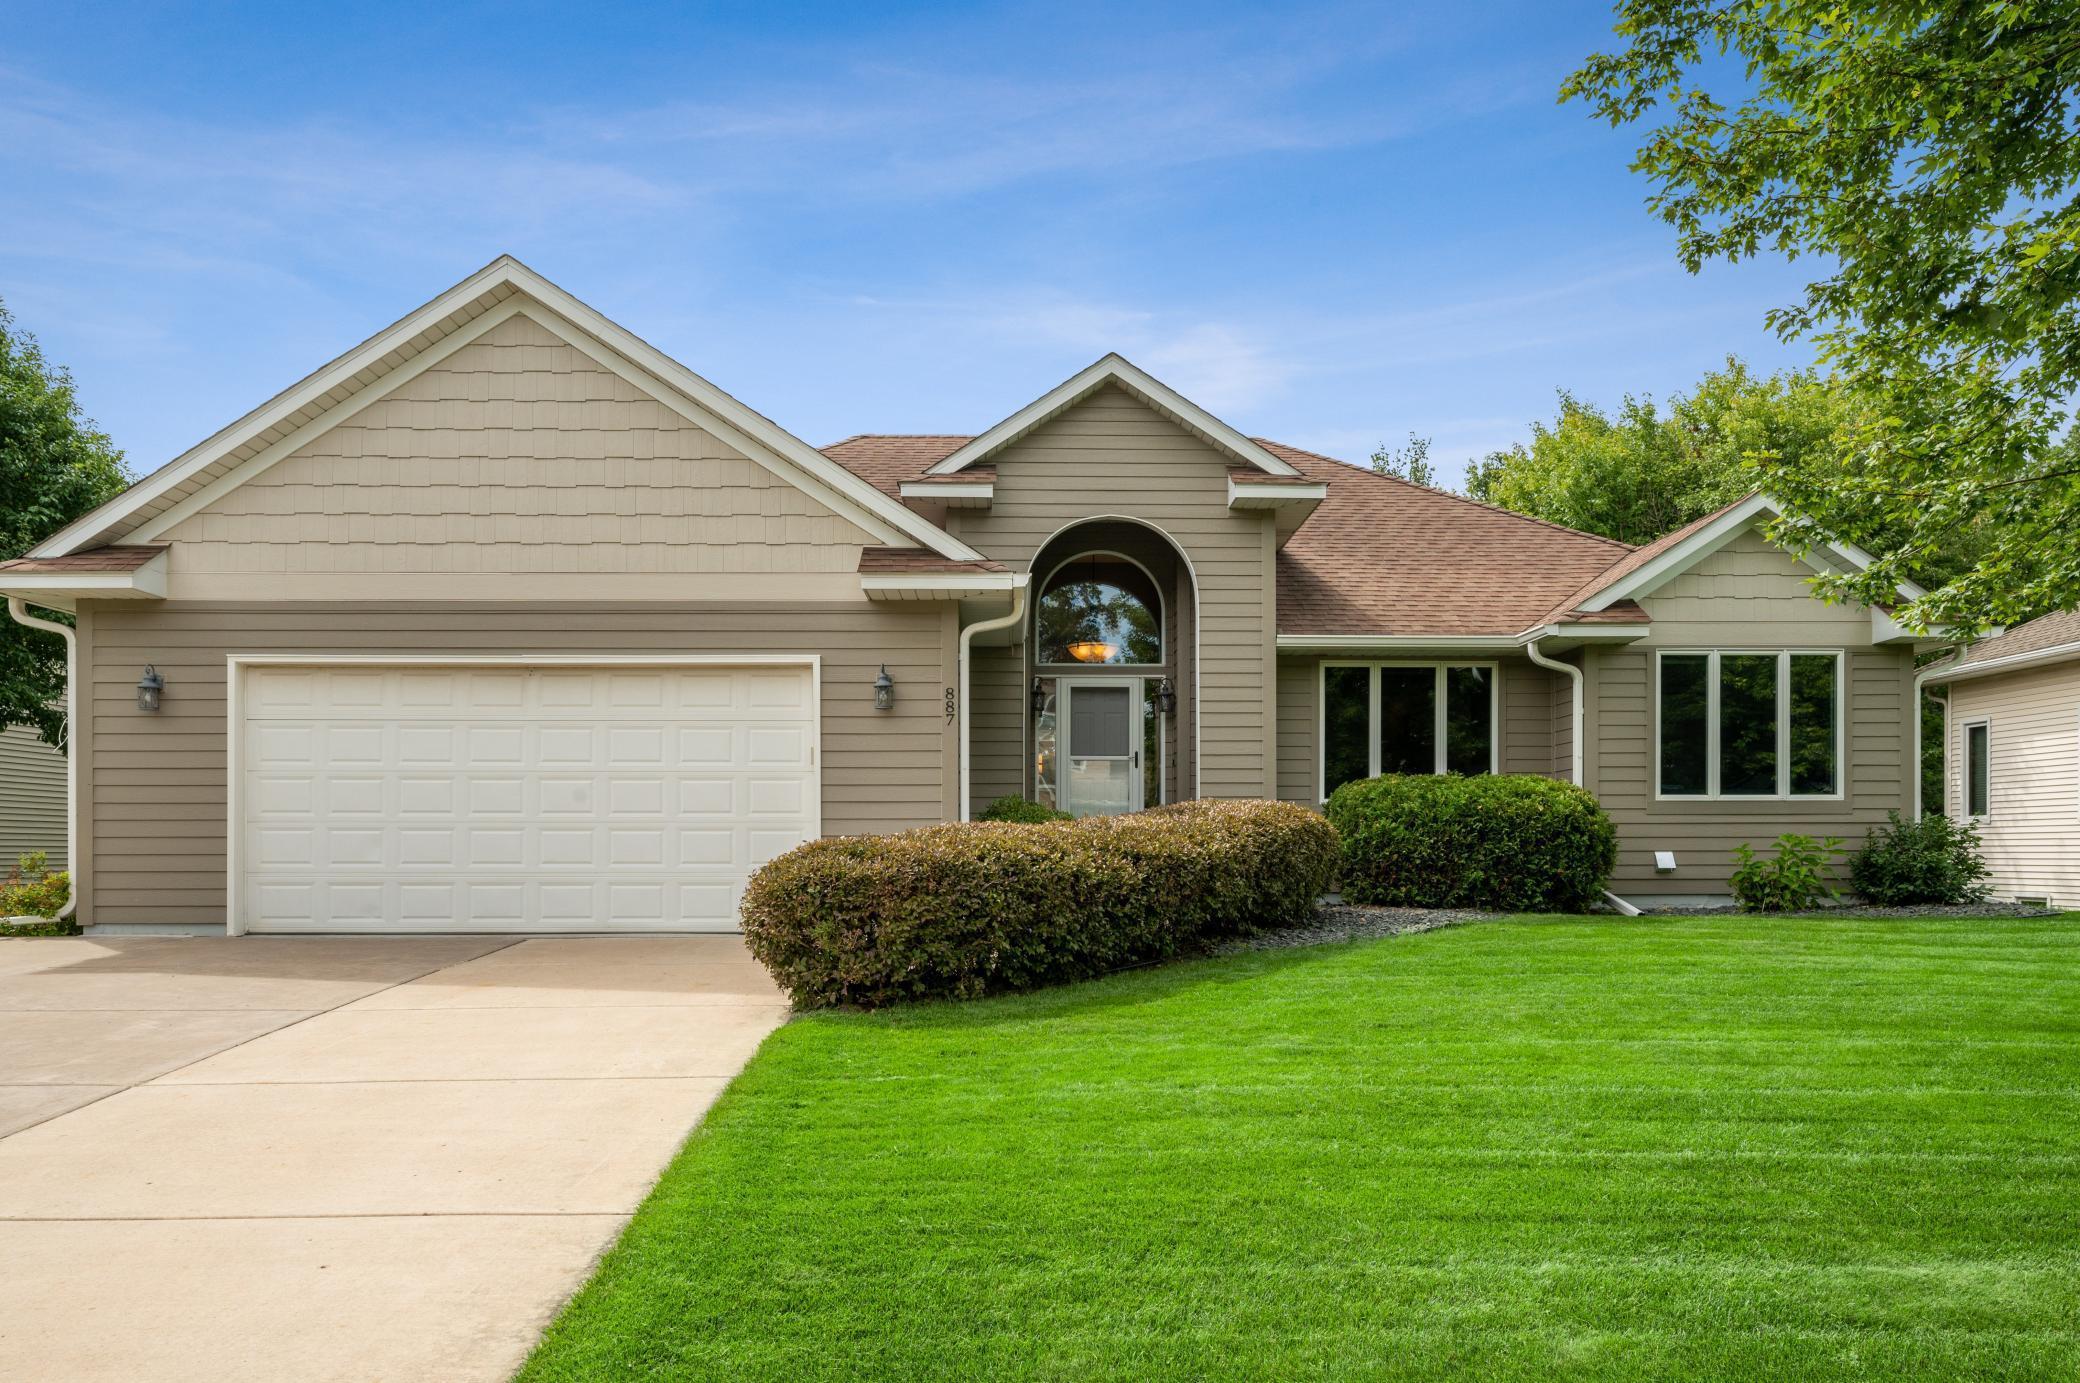 887 Deer Oak Run Property Photo - Mahtomedi, MN real estate listing